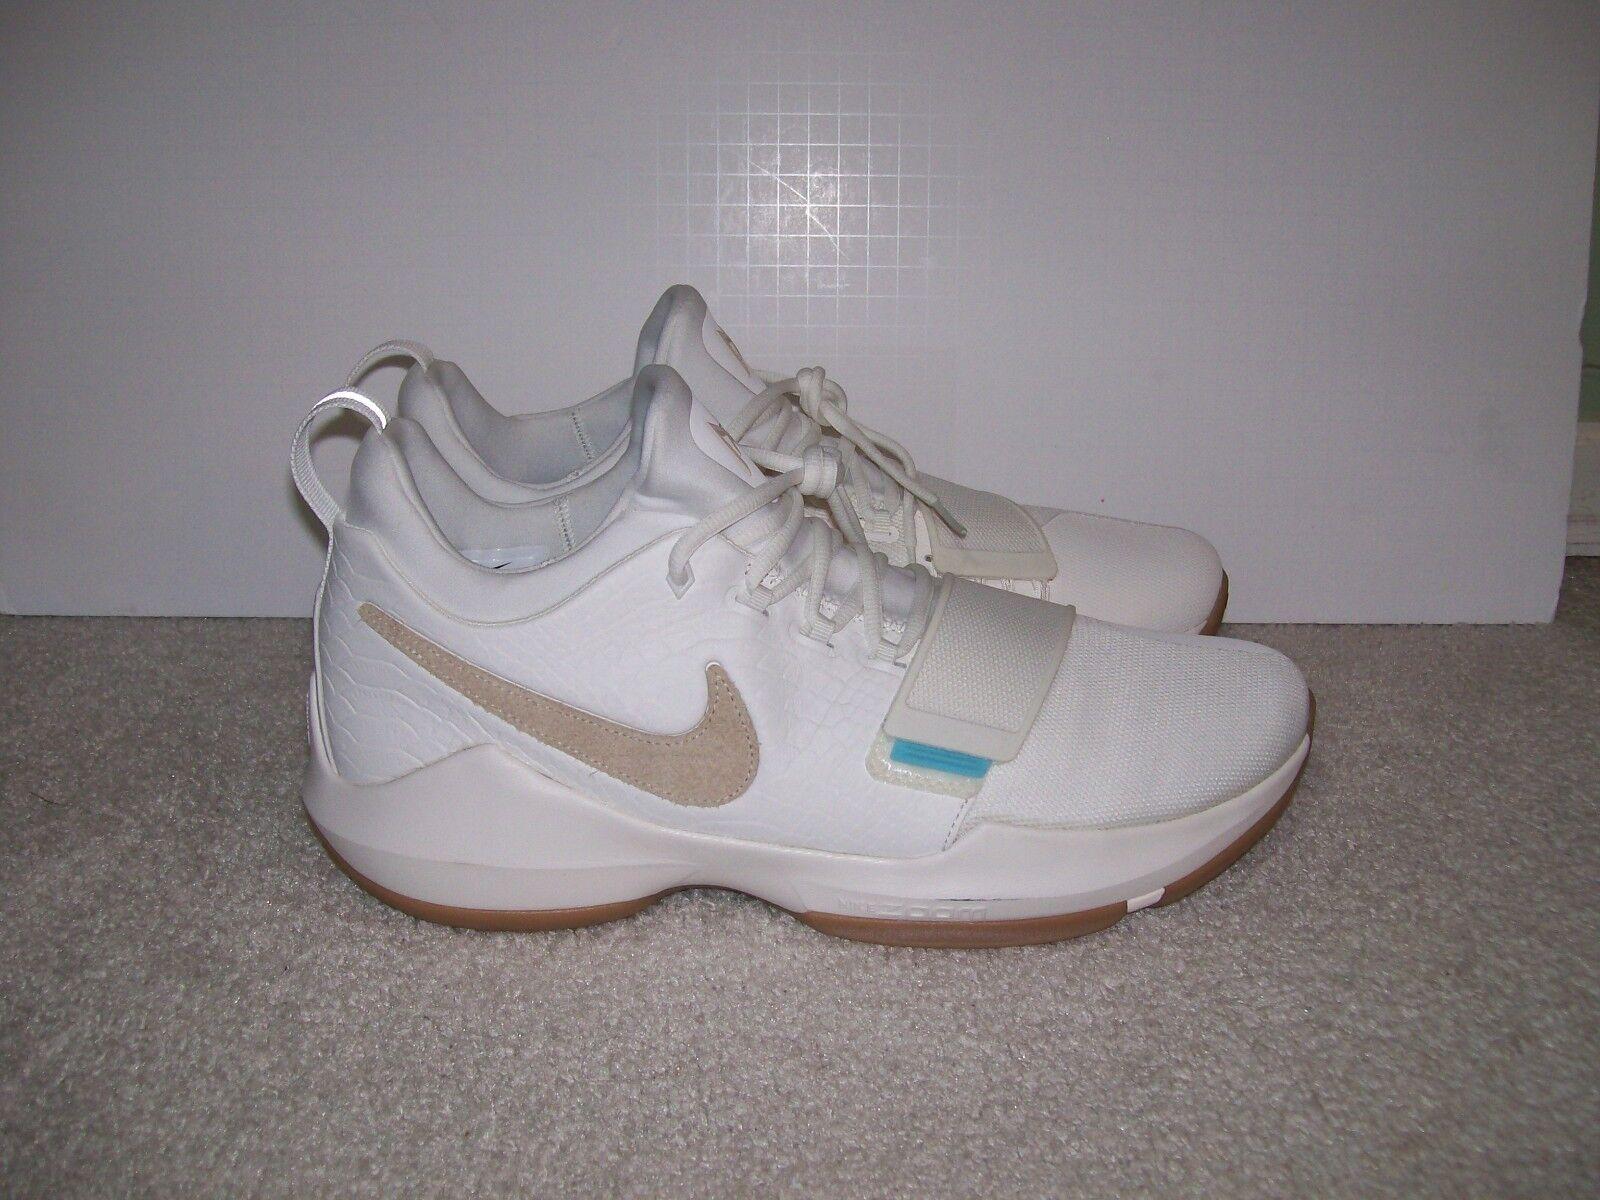 SZ 14 Nike PG 1 Summer Pack Pack Pack Ivory Oatmeal Gum 878627-110 PE Prossootype 2 3 Nasa c2efa1